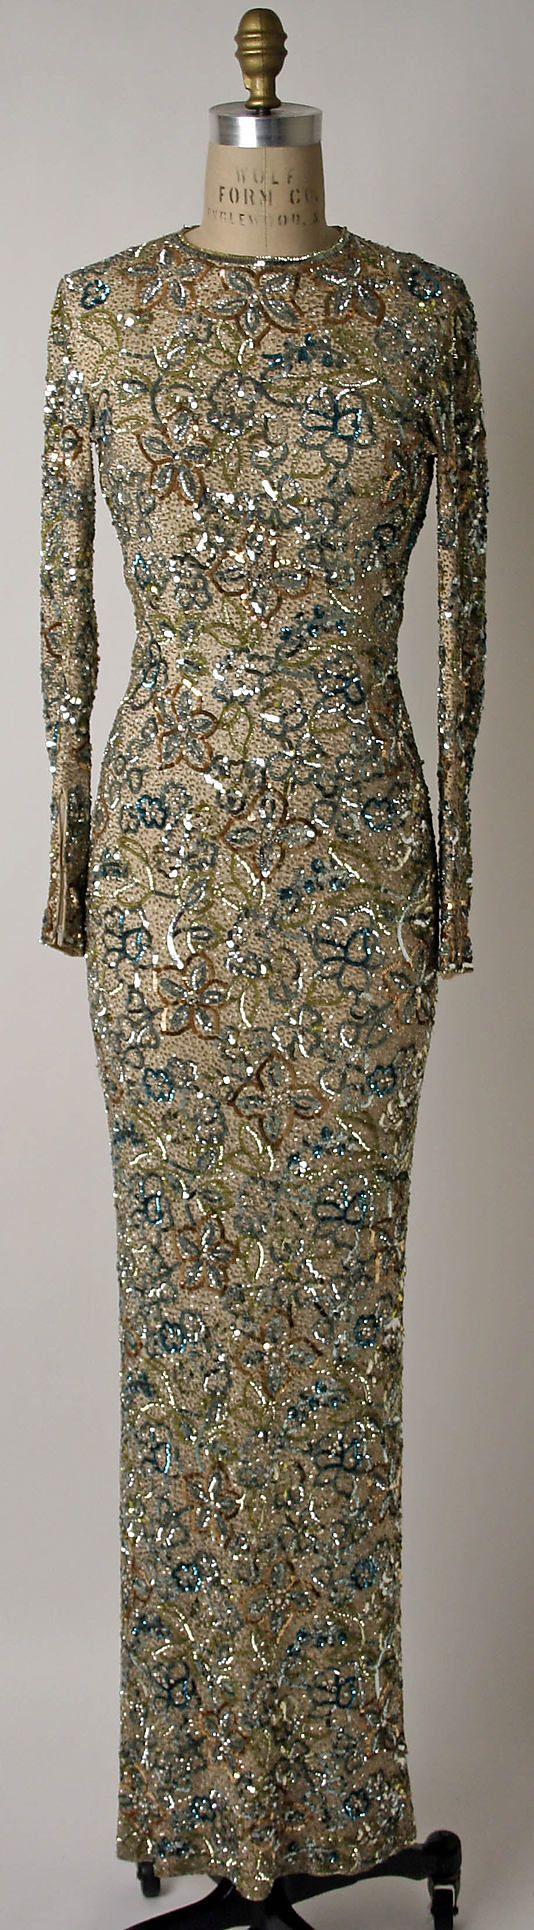 Evening dress 1950 silk, plastic, rhinestones by Norman NorellEvening Dresses, Norell American, Norman Norell, 1950 1965, Beautiful Dresses, New York, 1950 Silk, Dresses 1950, Norell 19501965